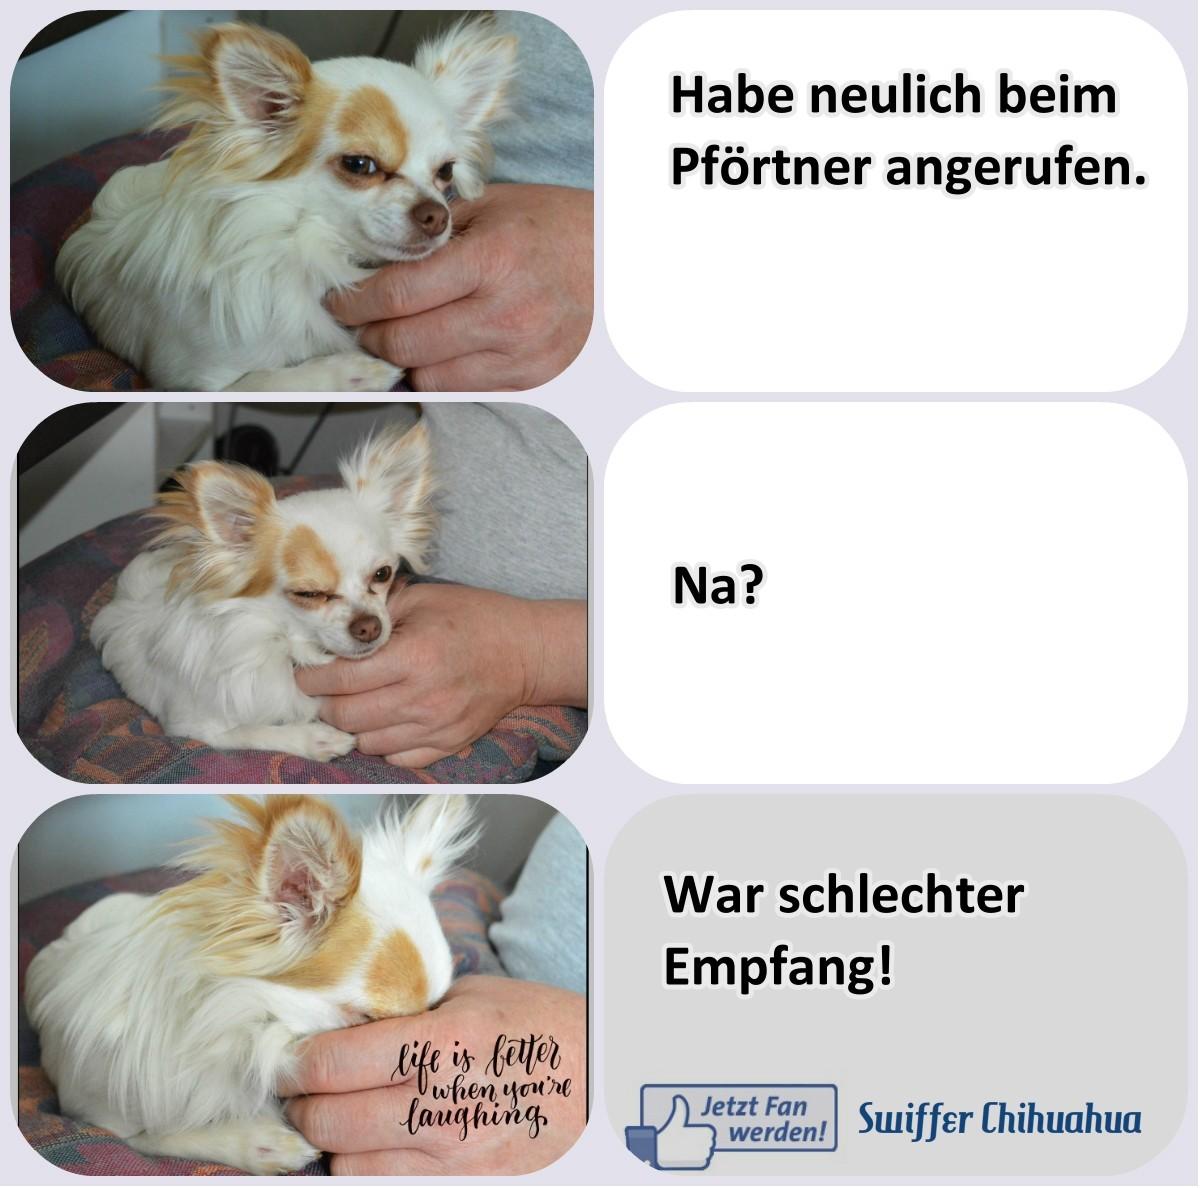 Chi-Love.de  | Flachwitze | BLOG | Magazin | Swiffer Chihuahua